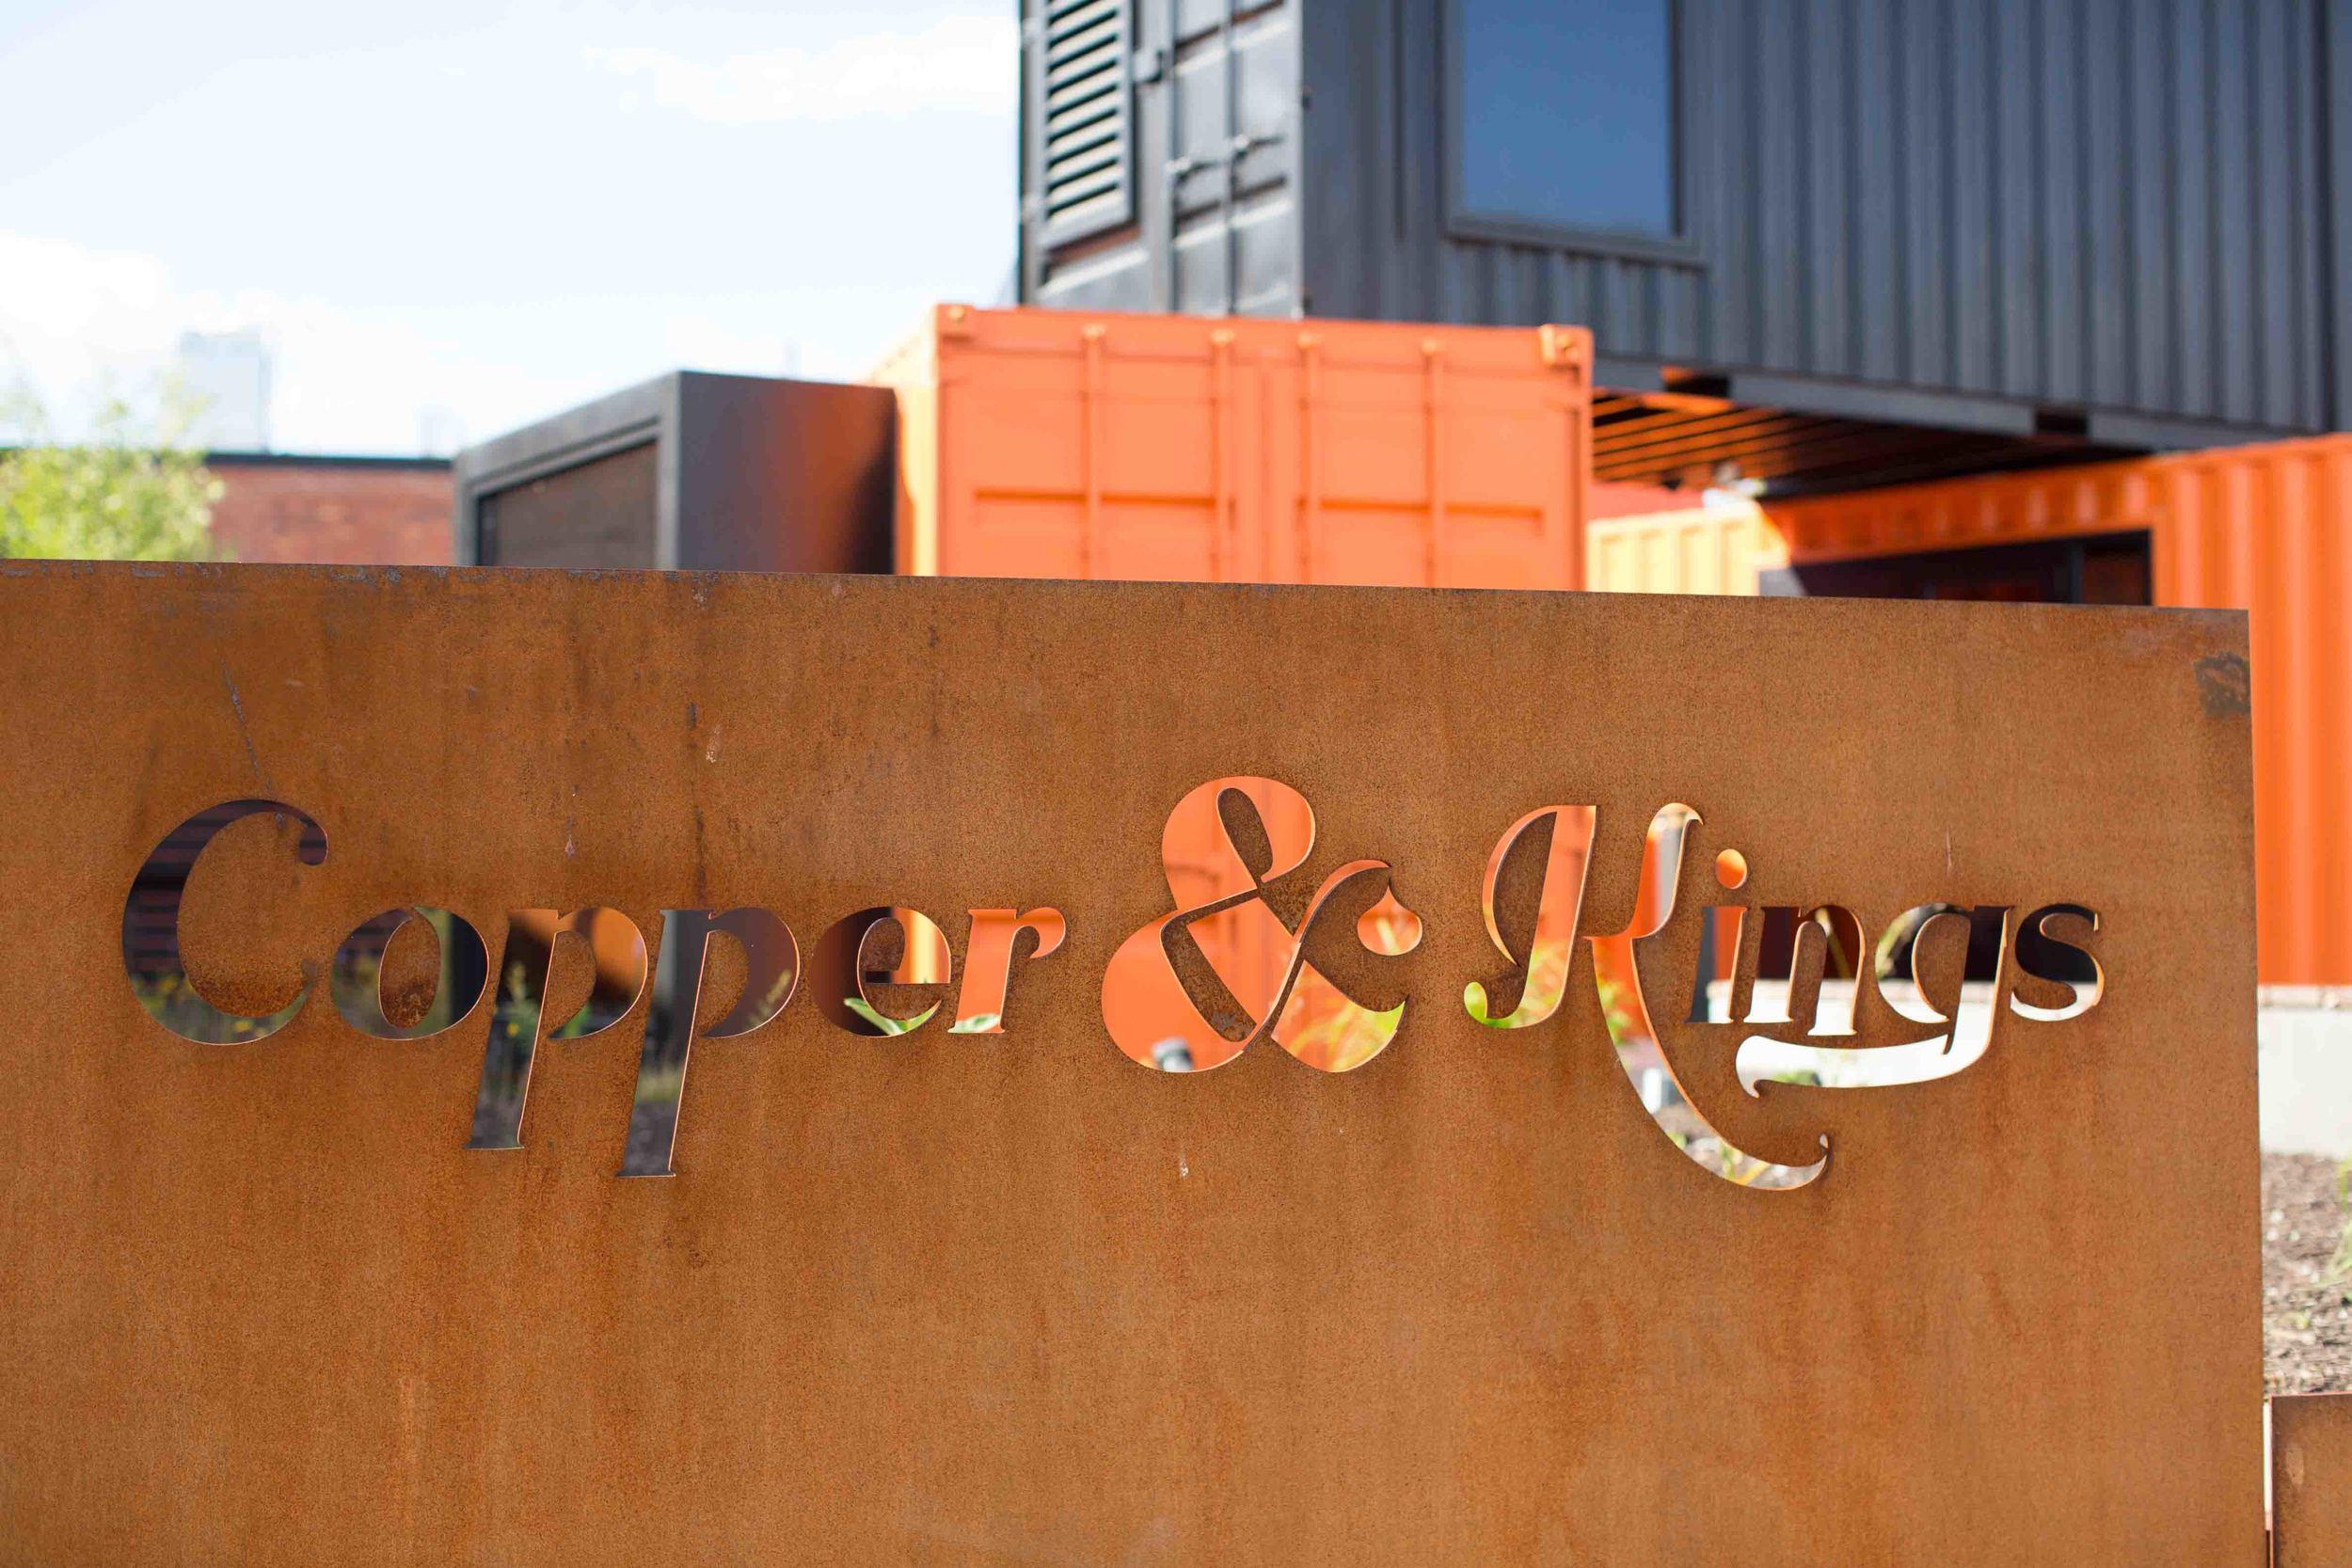 FEVA Seminar Copper & Kings 2015  (44 of 44).jpg